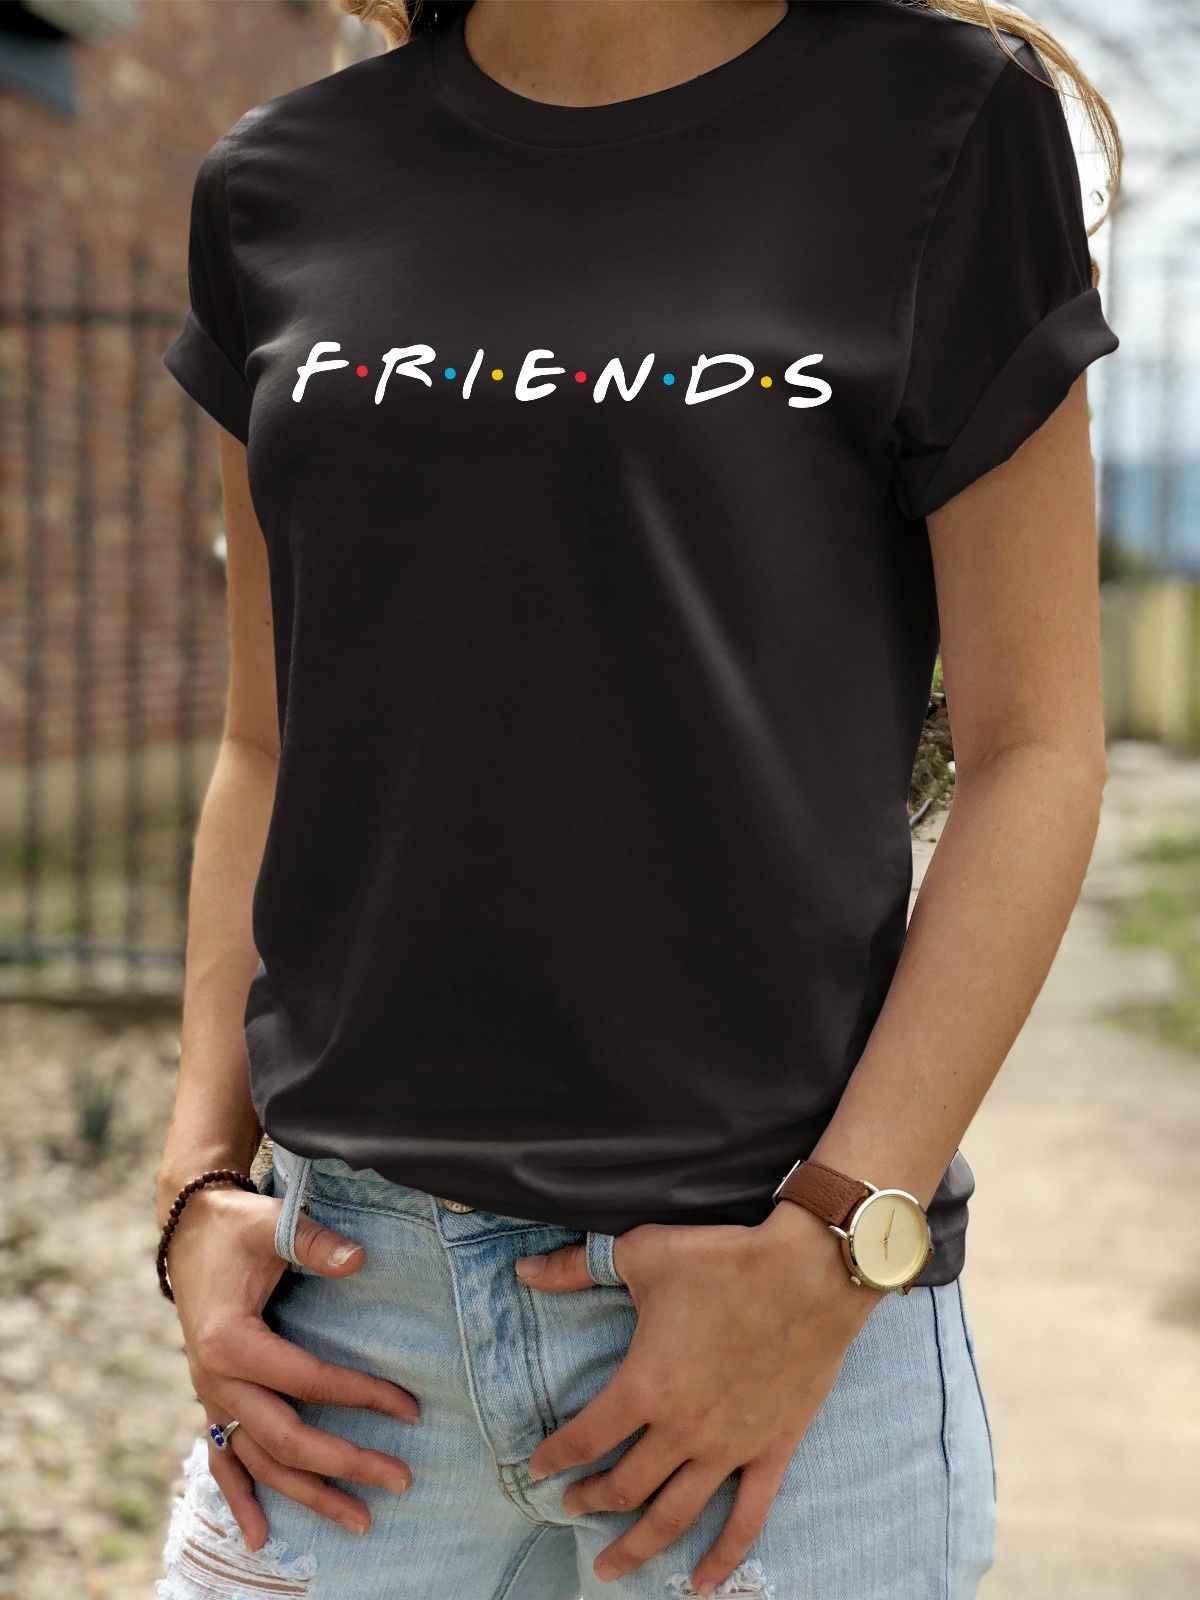 41e7cc232bd friends t shirt unisex. tv series joey ross rachel loose casual baggy  fashion Cool Casual